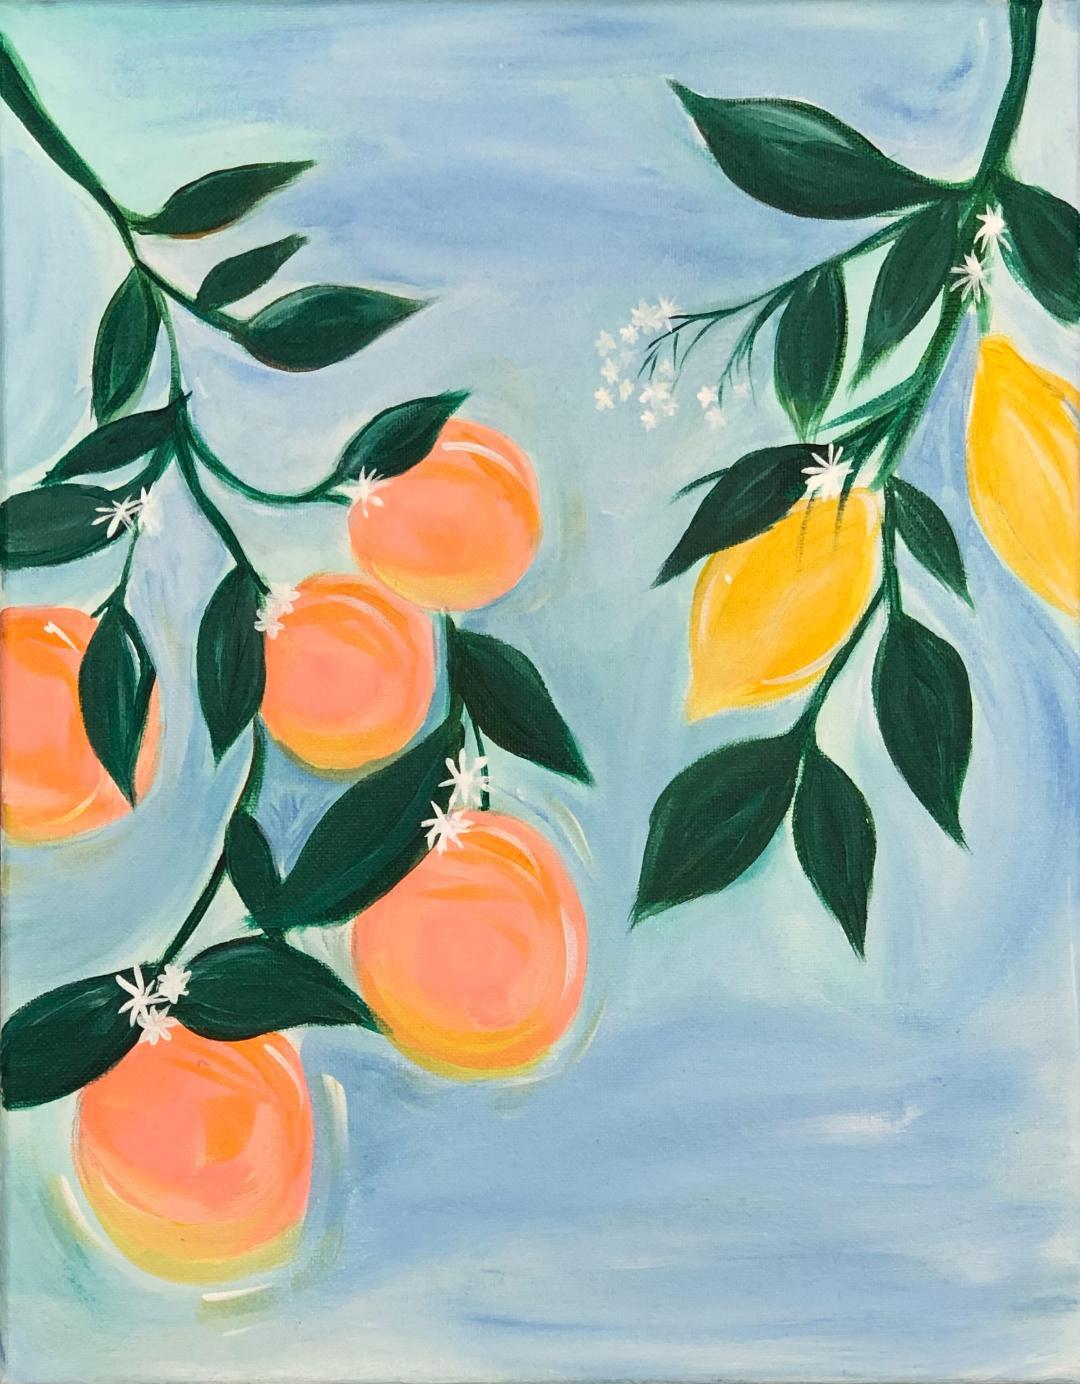 Peaches & Lemons